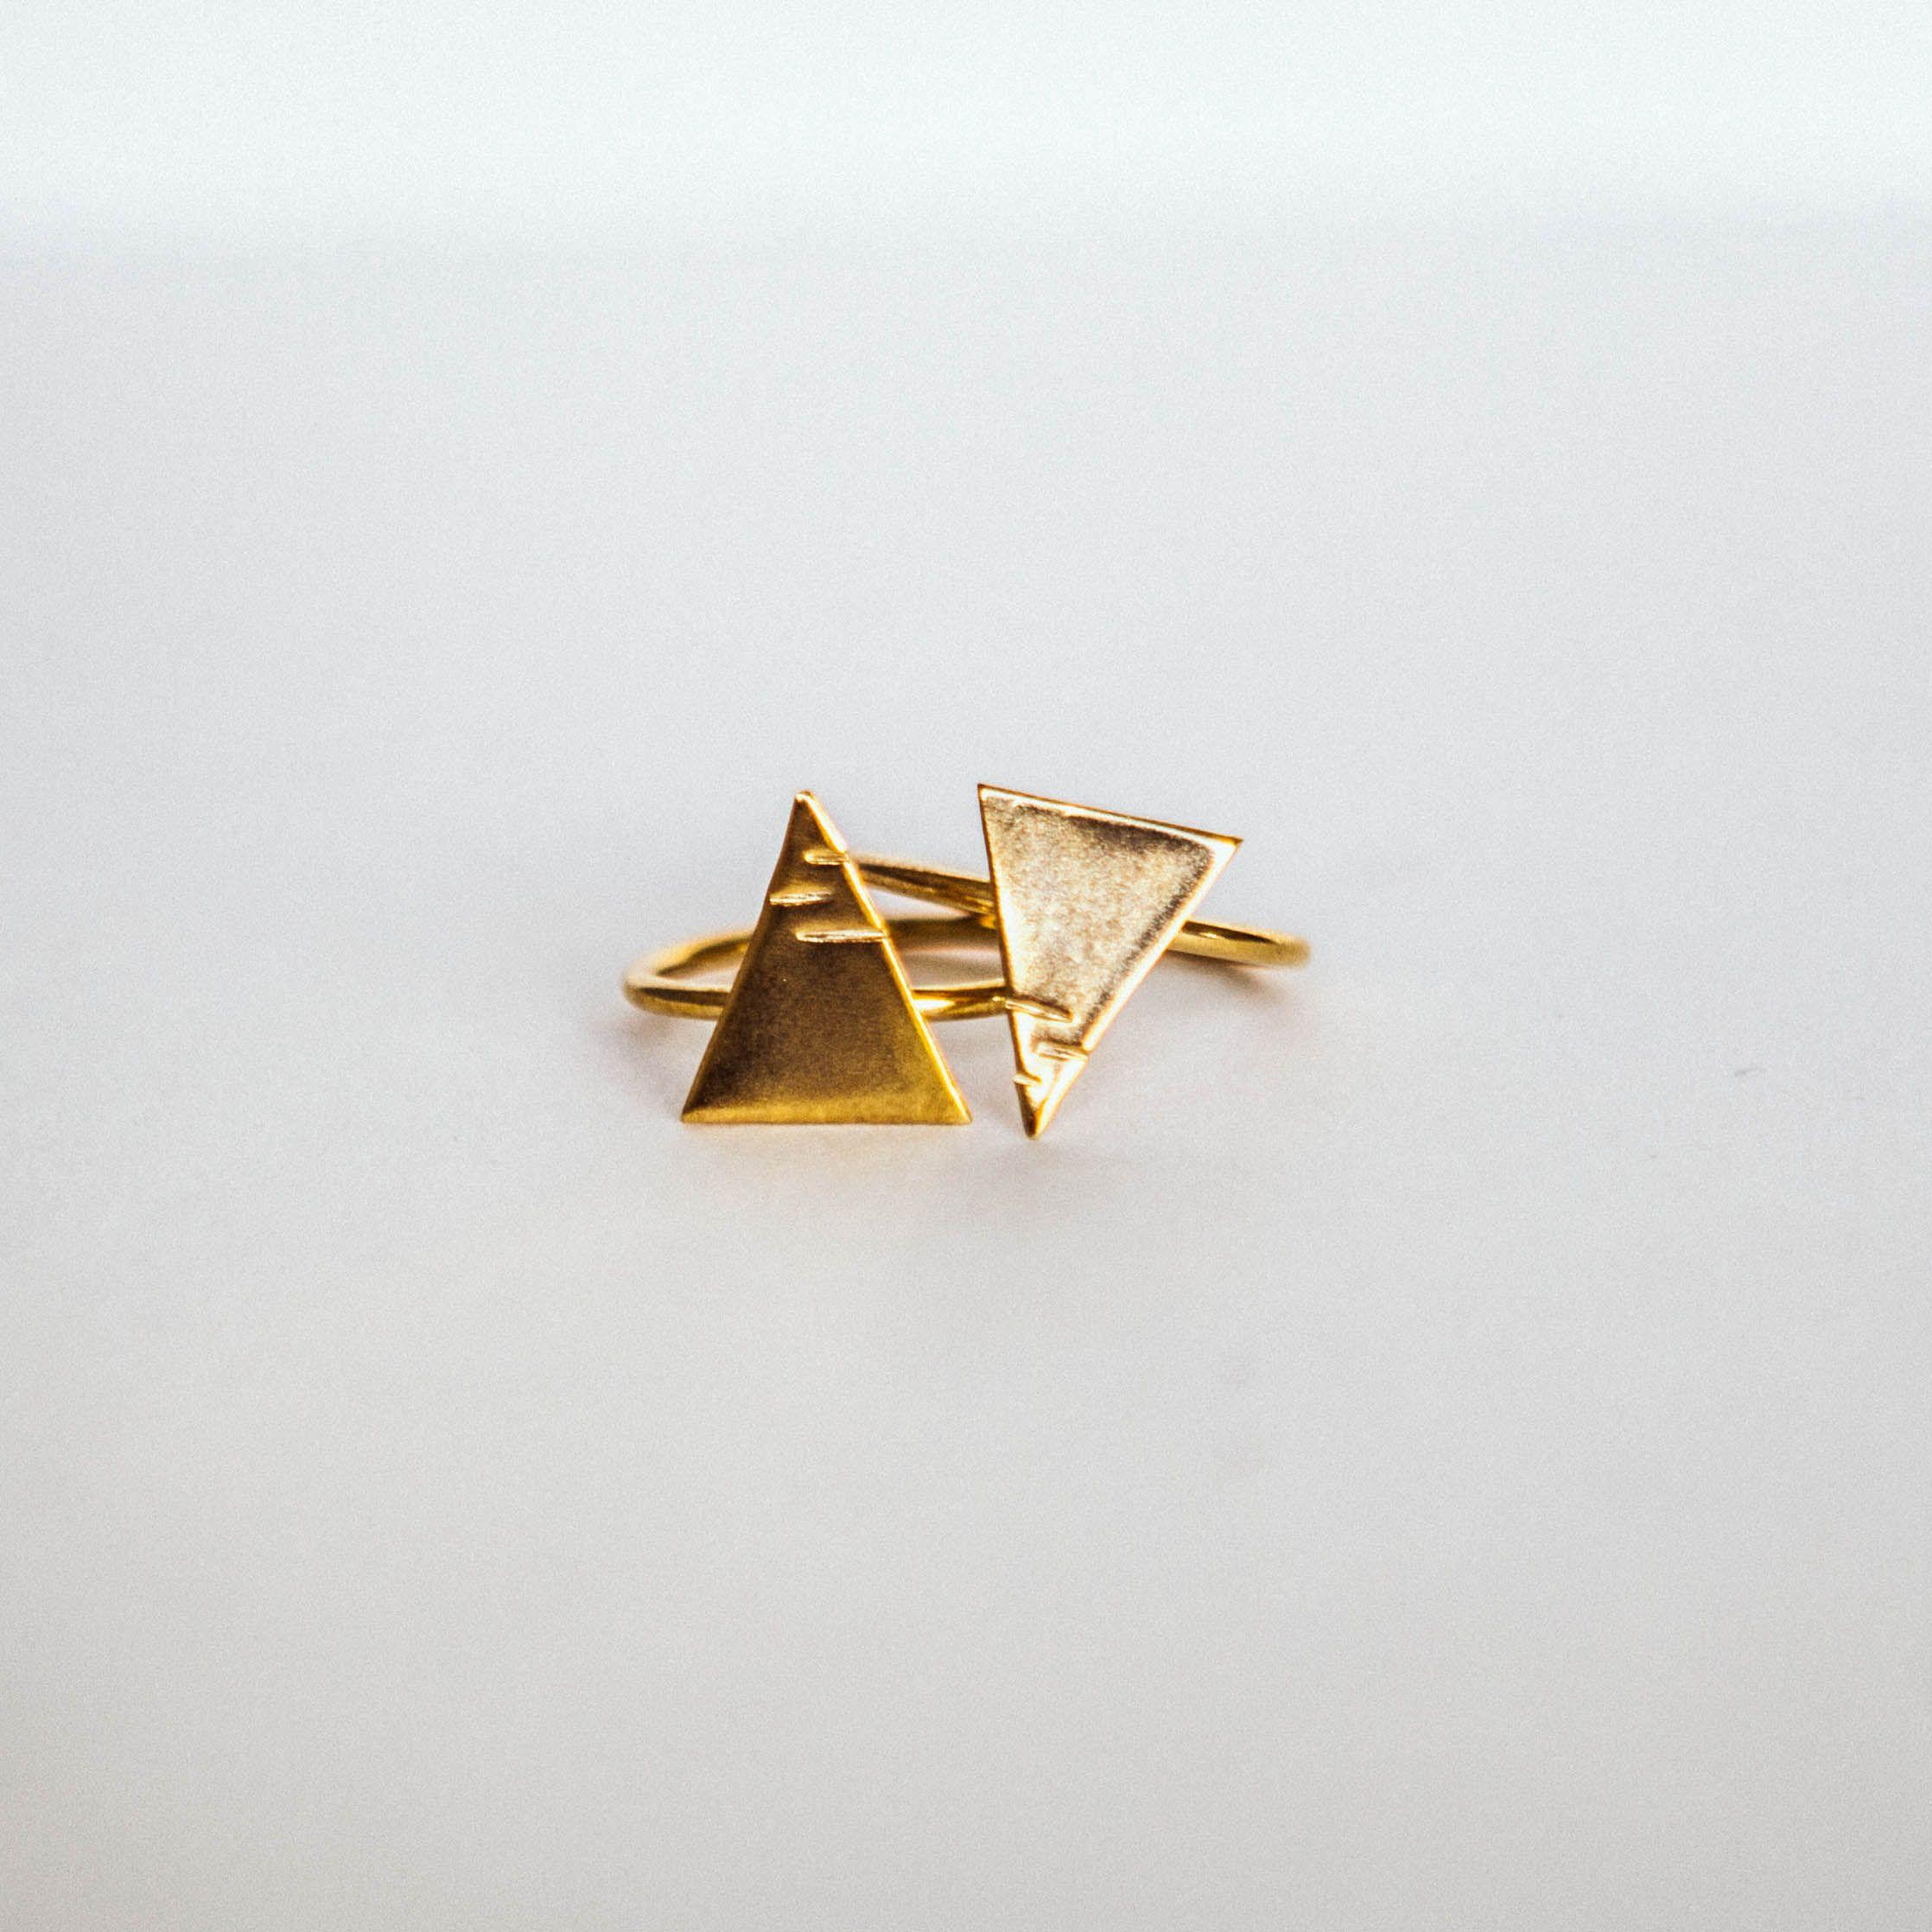 The New City Triangle Rings | #turkish #gold #sleek #design #style #fashion #turklynpazaar www.turklynpazaar.com